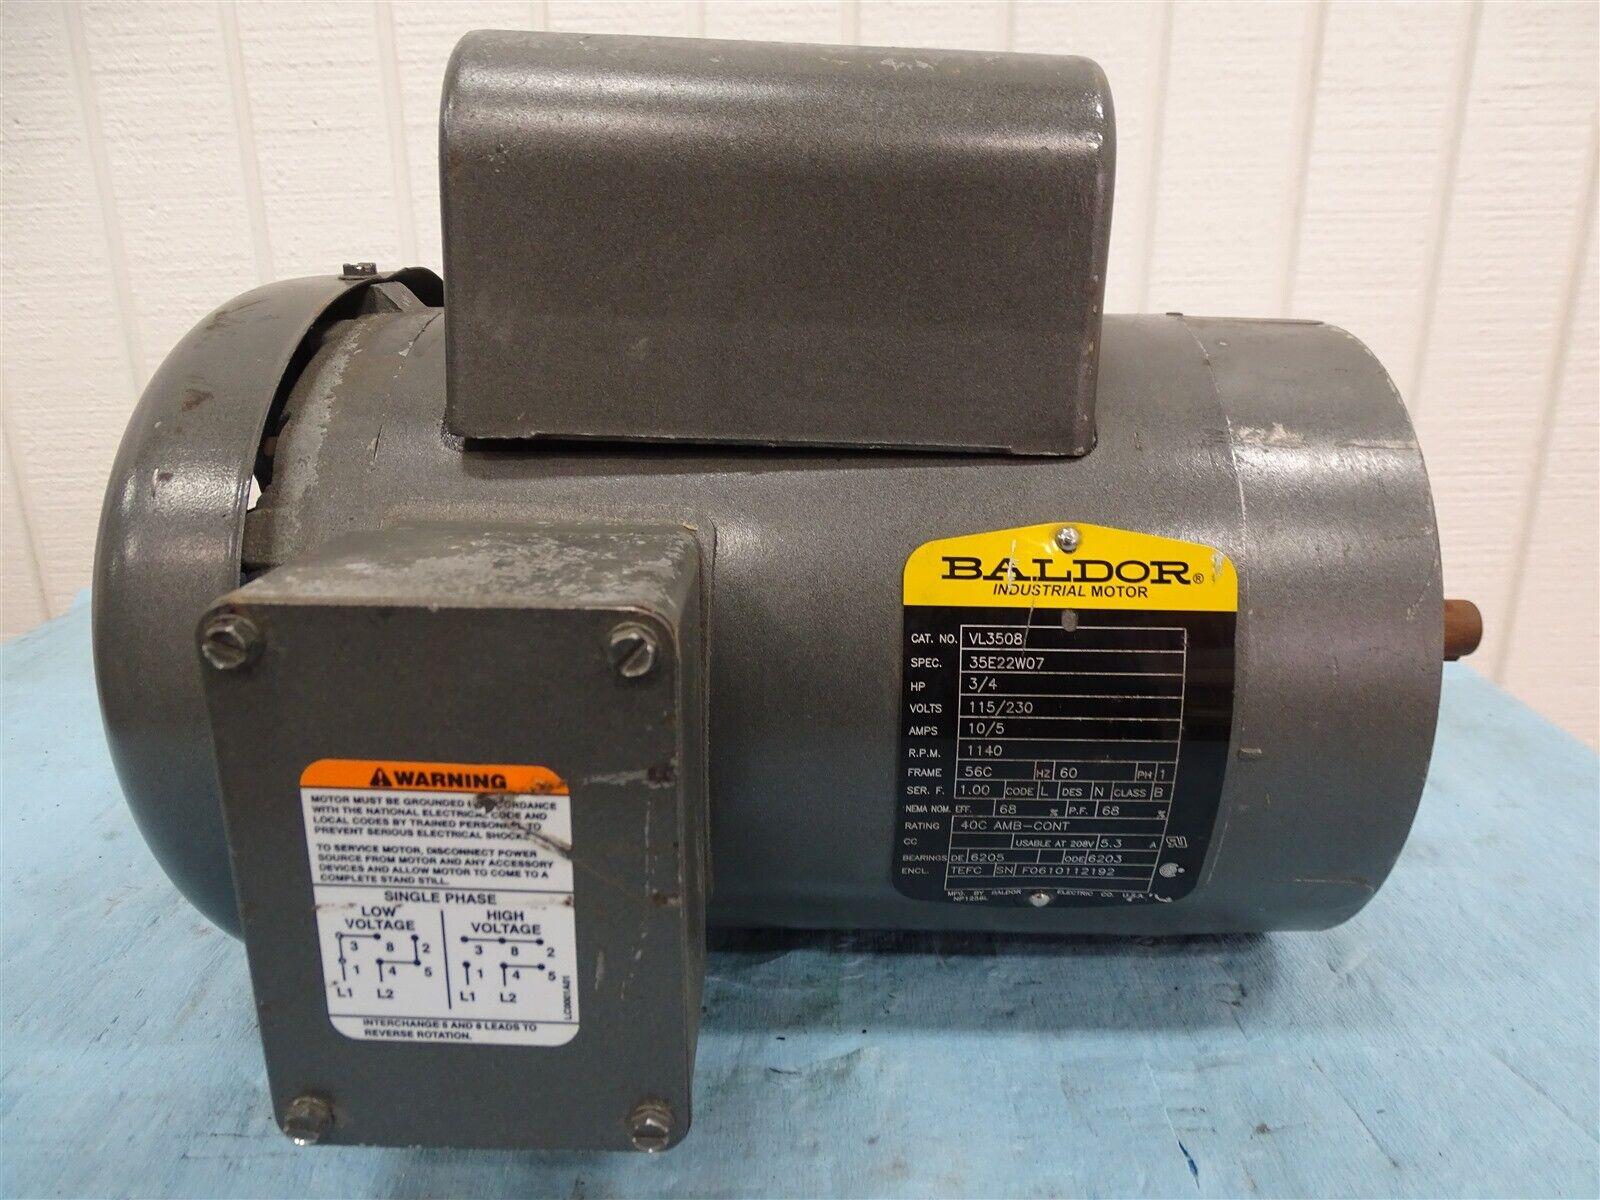 Baldor VL3508 Motor 3/4HP 1140RPM 1PH 115/230VAC 10/5A 56C